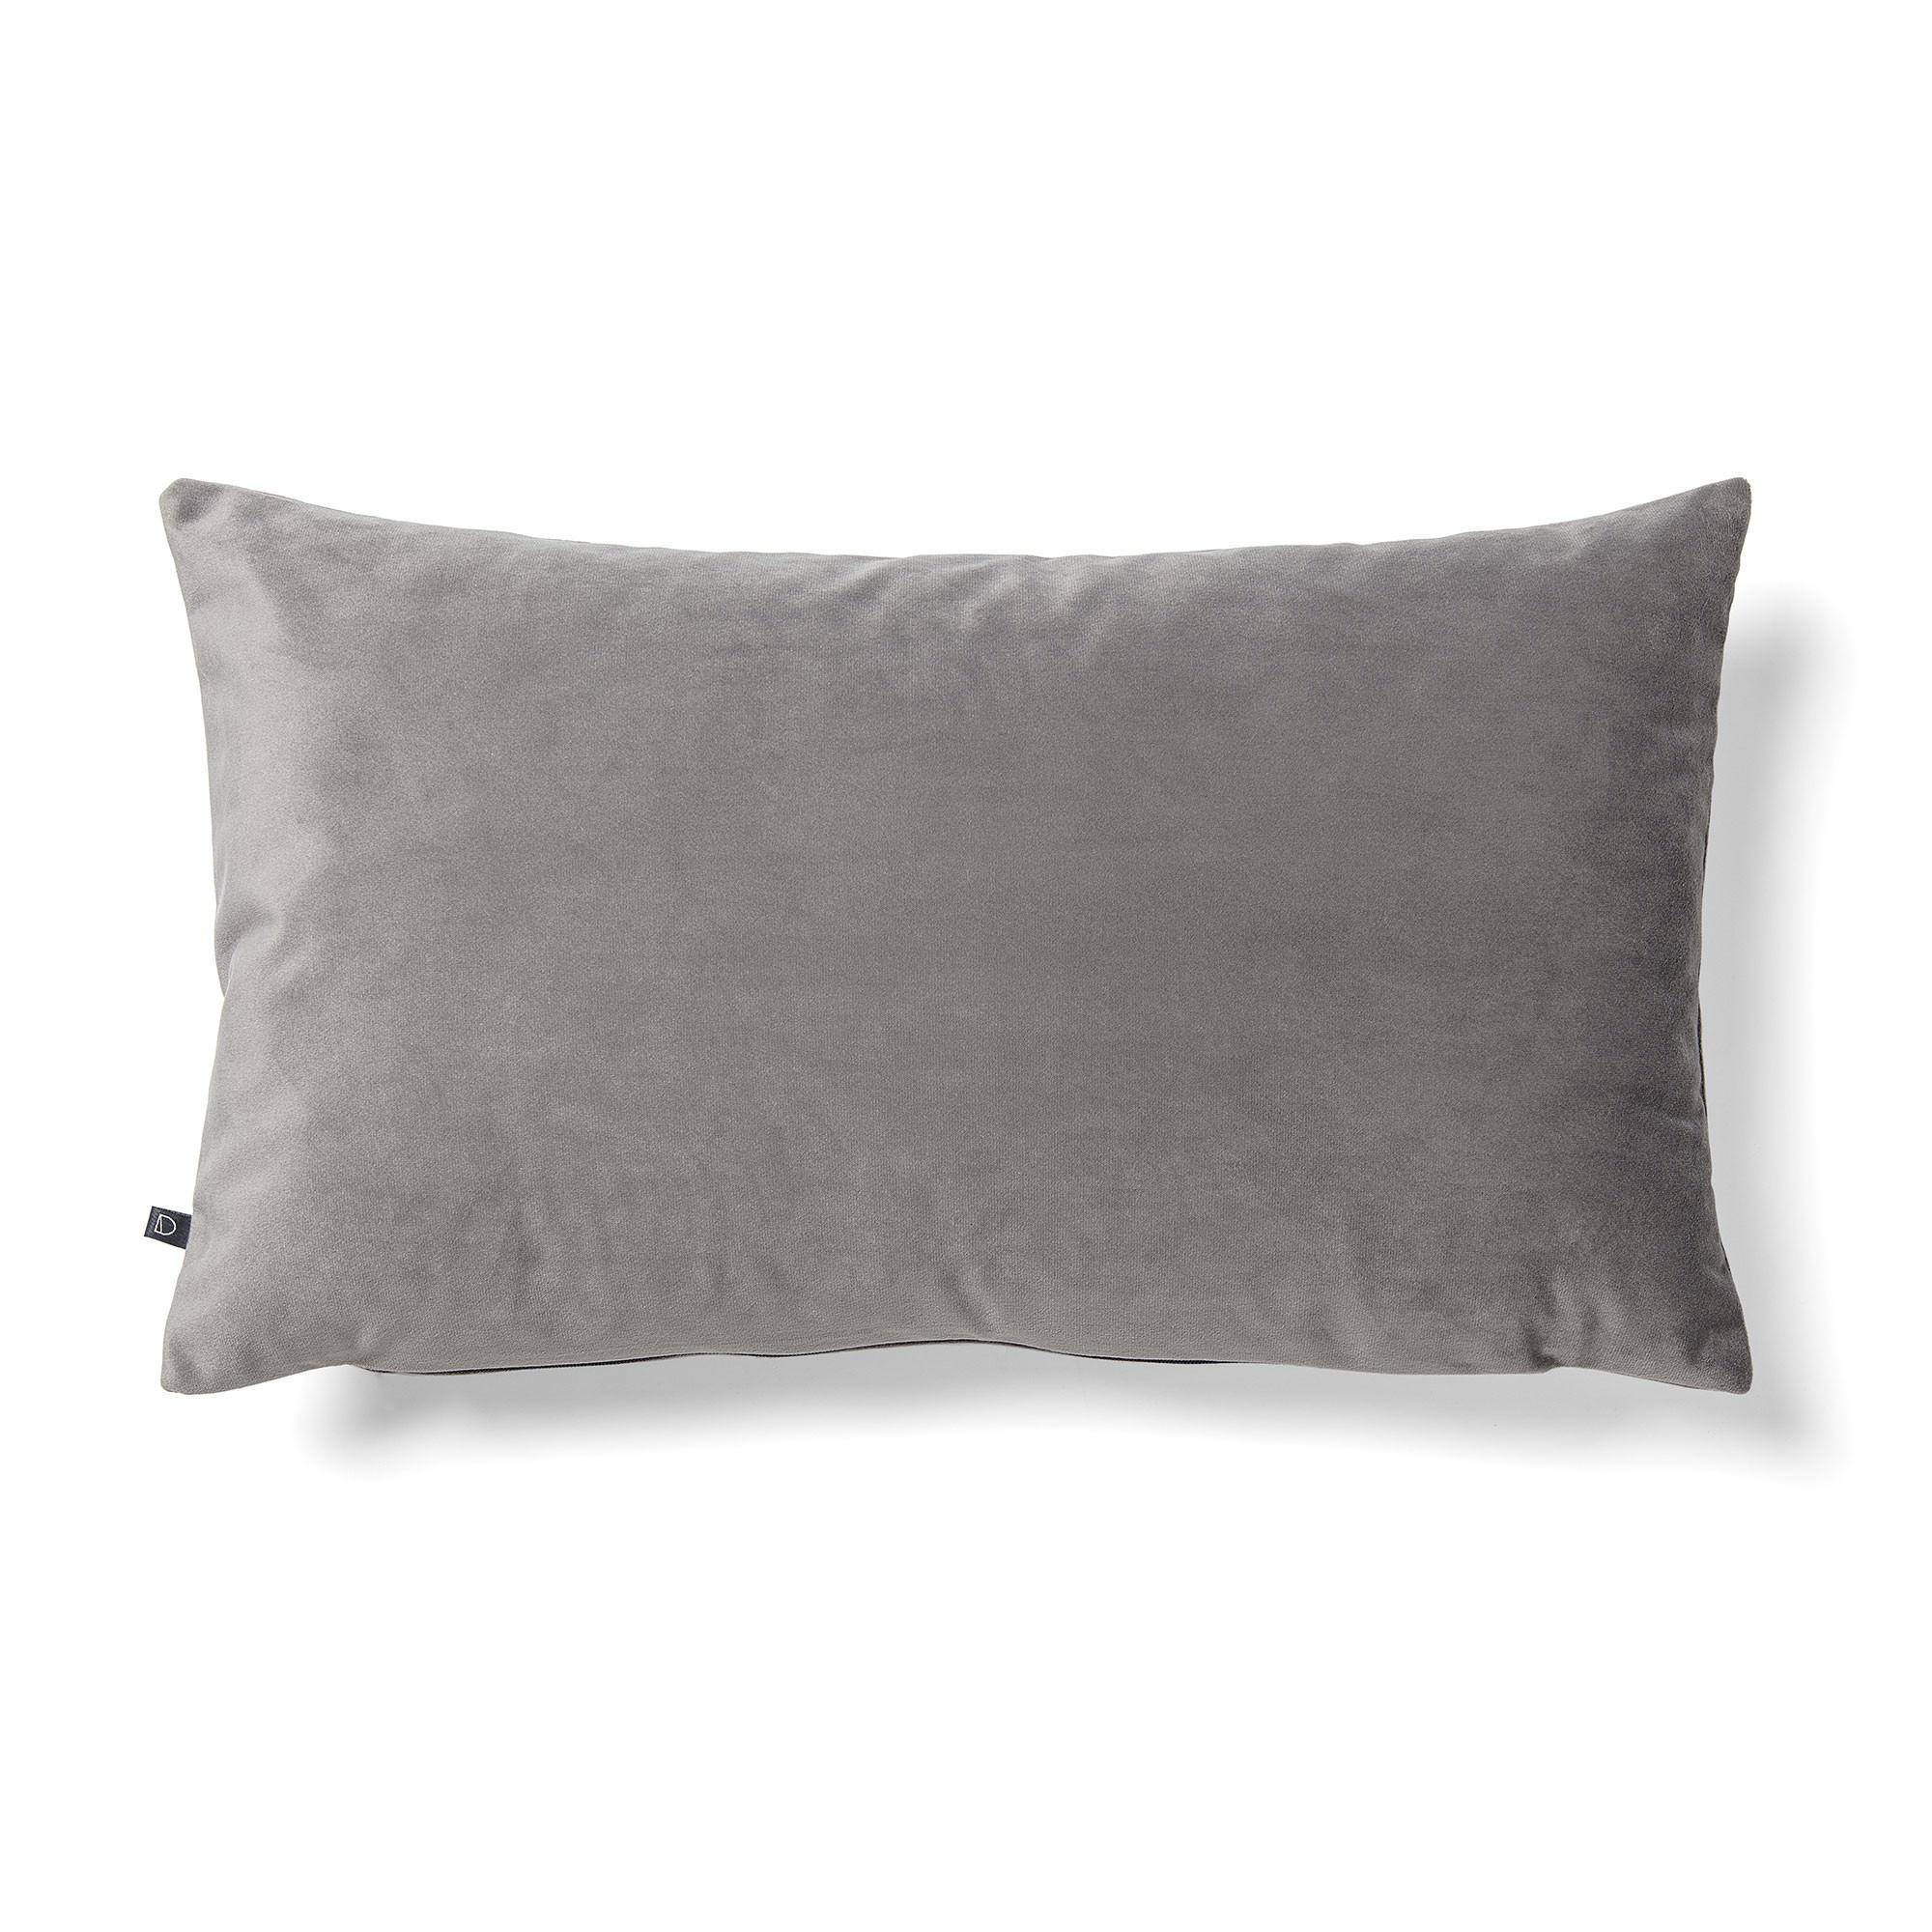 Daraya Velvet Fabric Lumbar Cushion, Grey